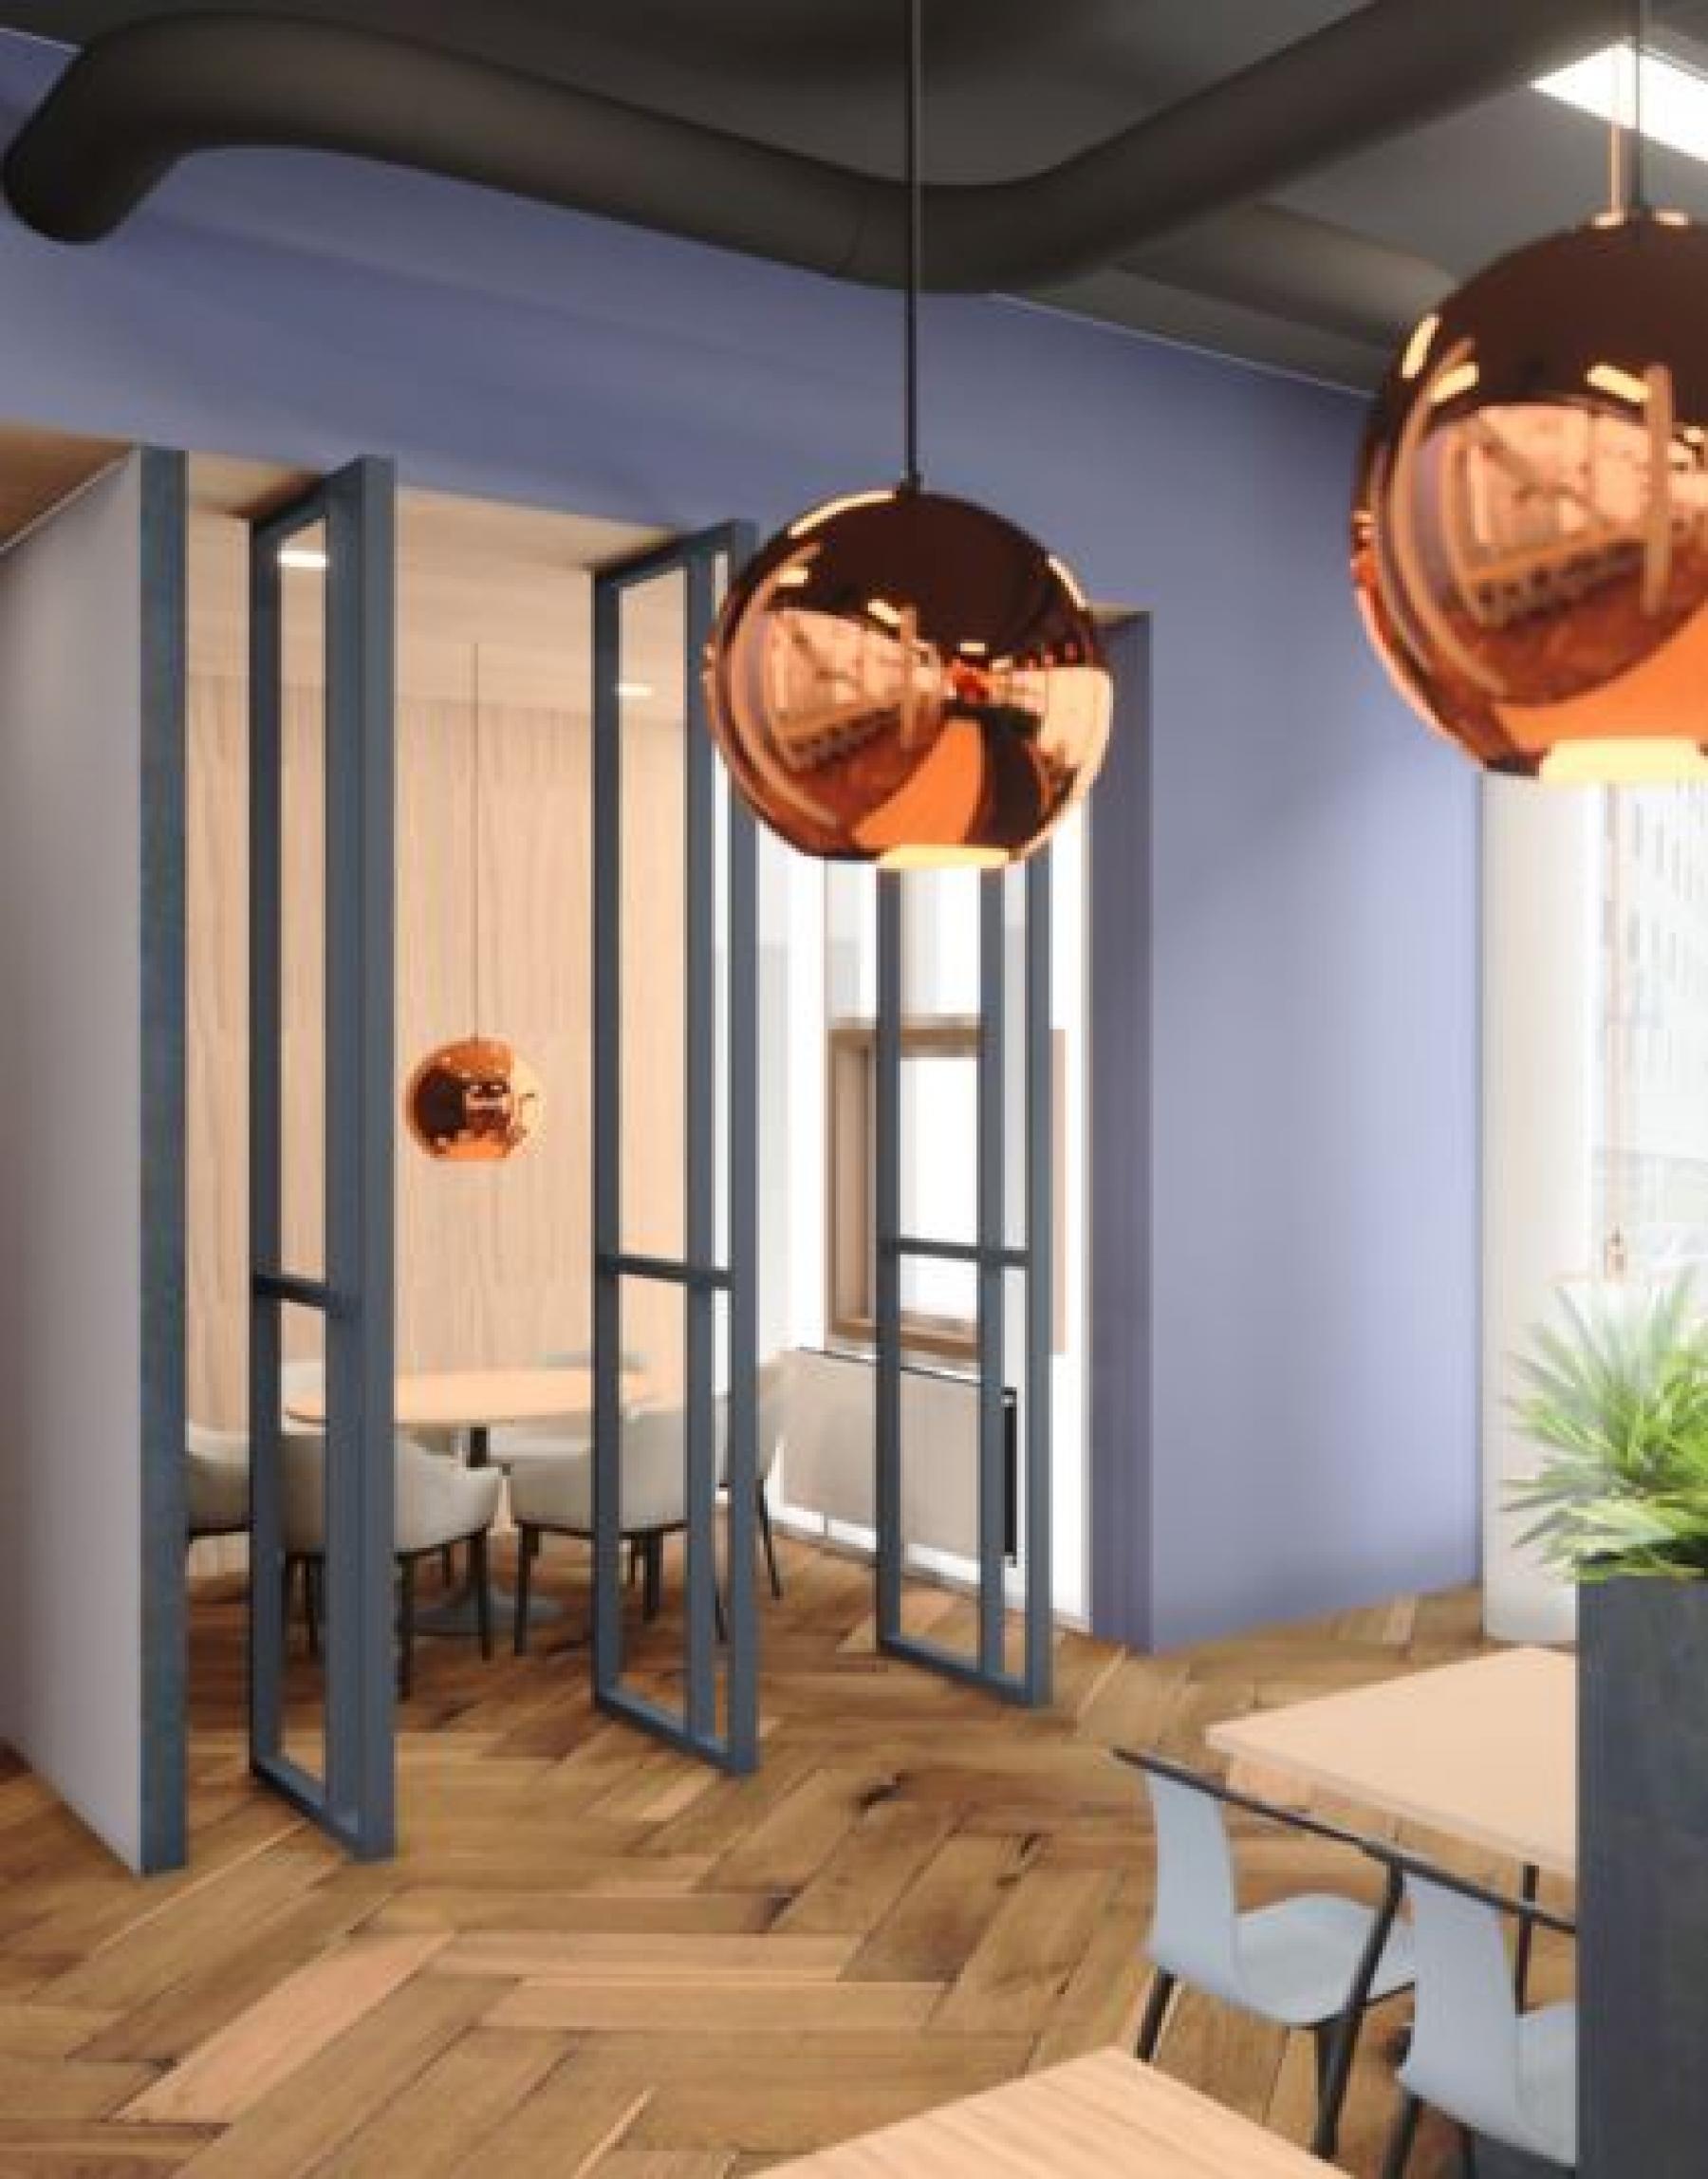 werkplek kantoorruimte huren amersfoort maanlander loungeplekken vergaderruimte